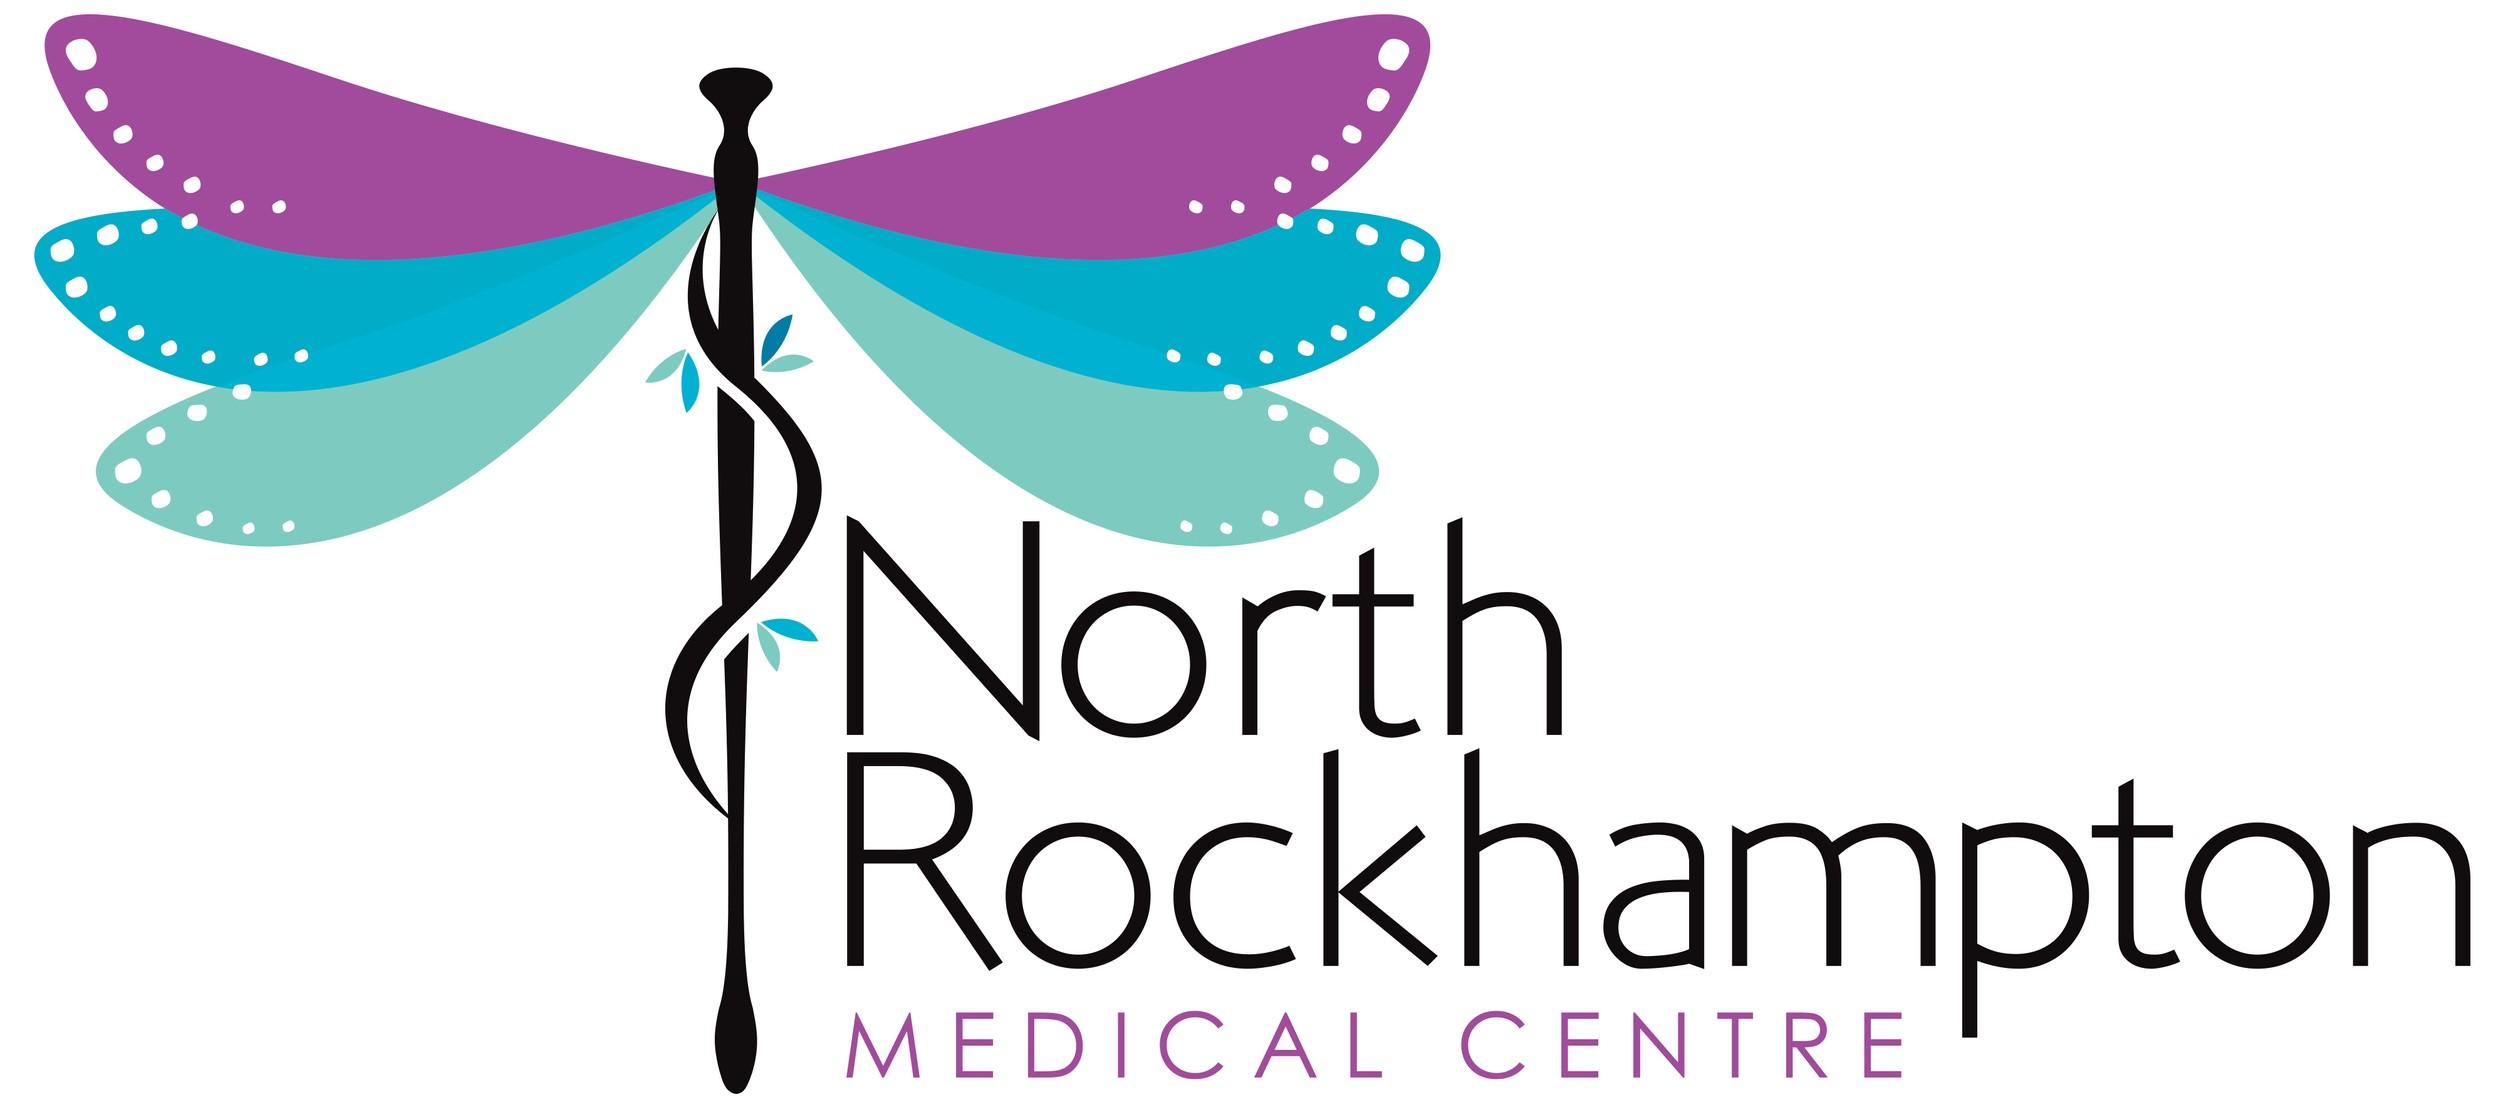 North Rockhampton Medical Centre Logo